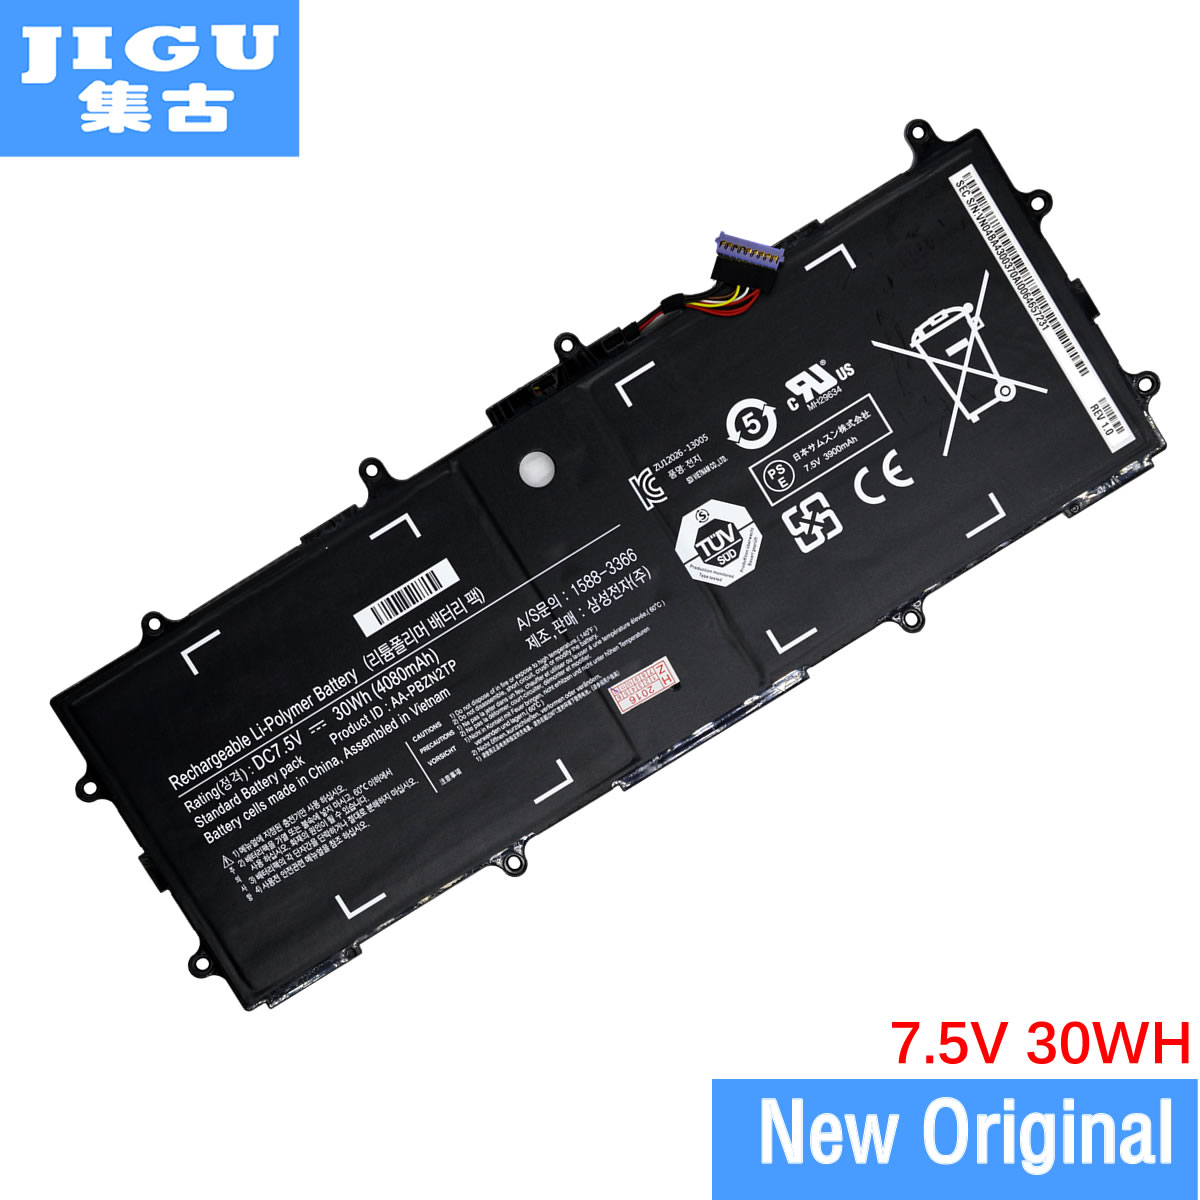 JIGU AA-PB2N2TP AA-PBZN2TP Originalbatteri batteri för SAMSUNG 905S3G 910S3G 915S3G XE303C12 för Chromebook 2 3 30WH